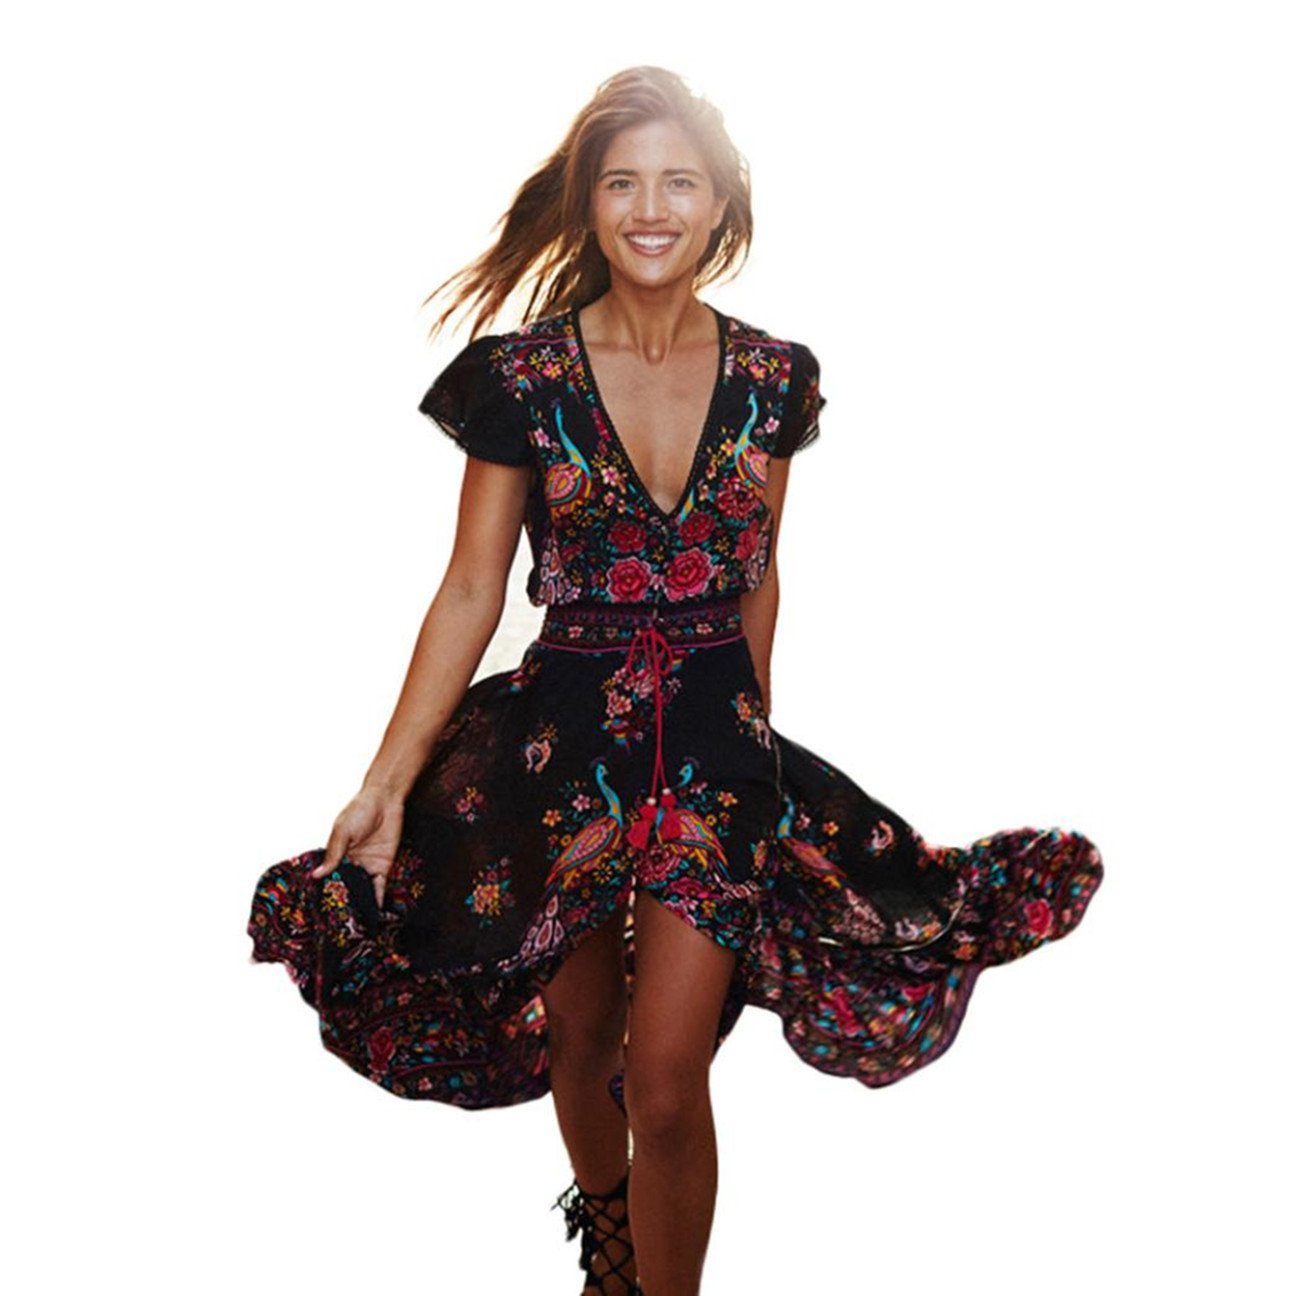 Taore Women Print Floral Retro Palace V-Neck Beach Dress Evening Party Dress, XS~L (XS, Black)